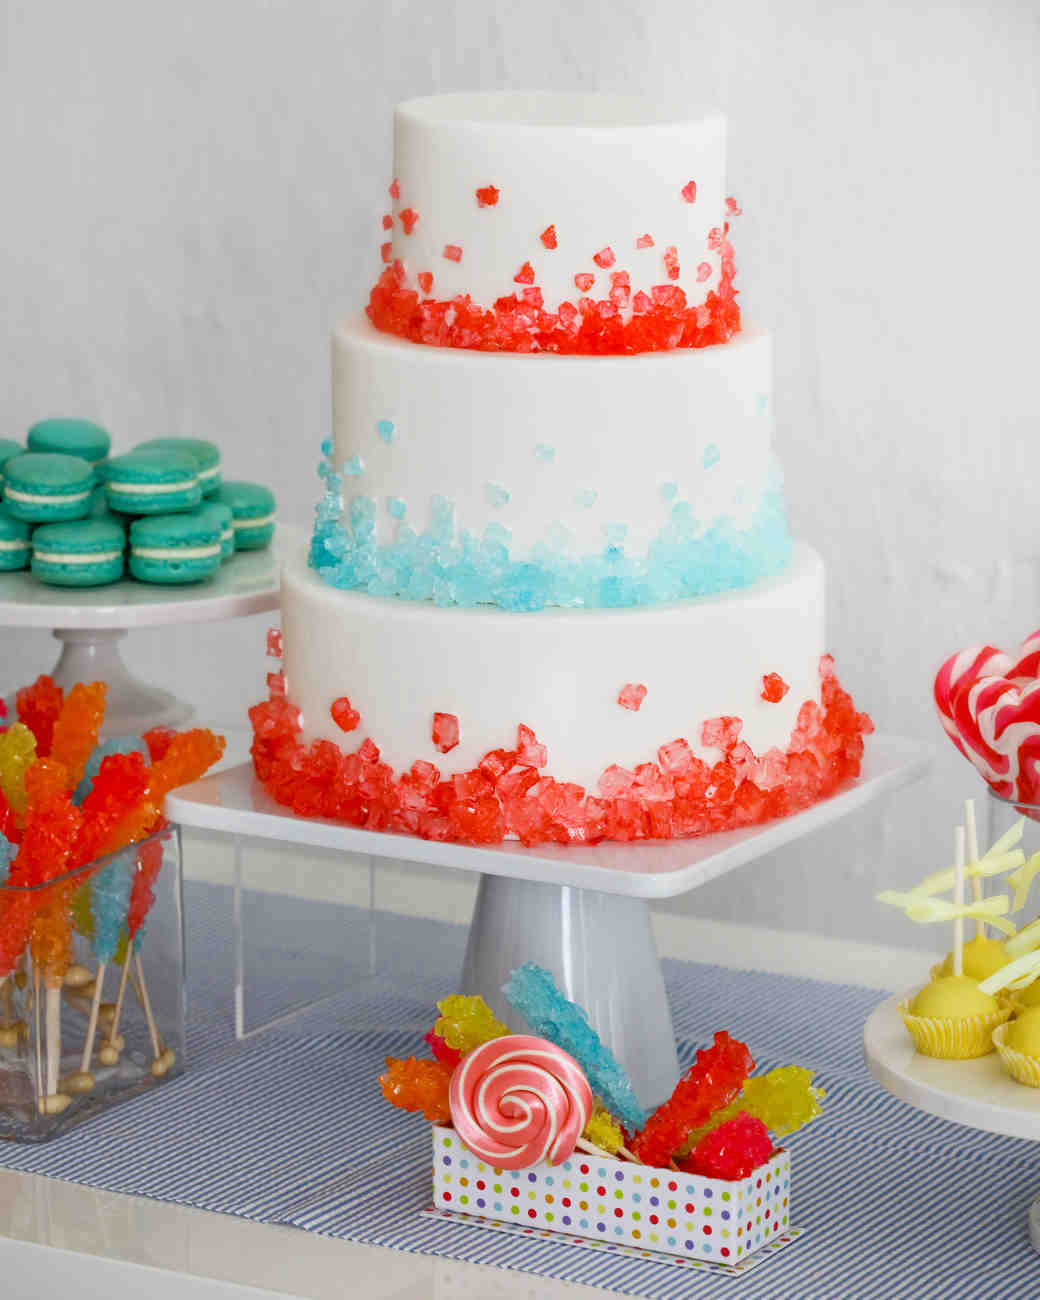 cake-pros-cocoafig-0414.jpg